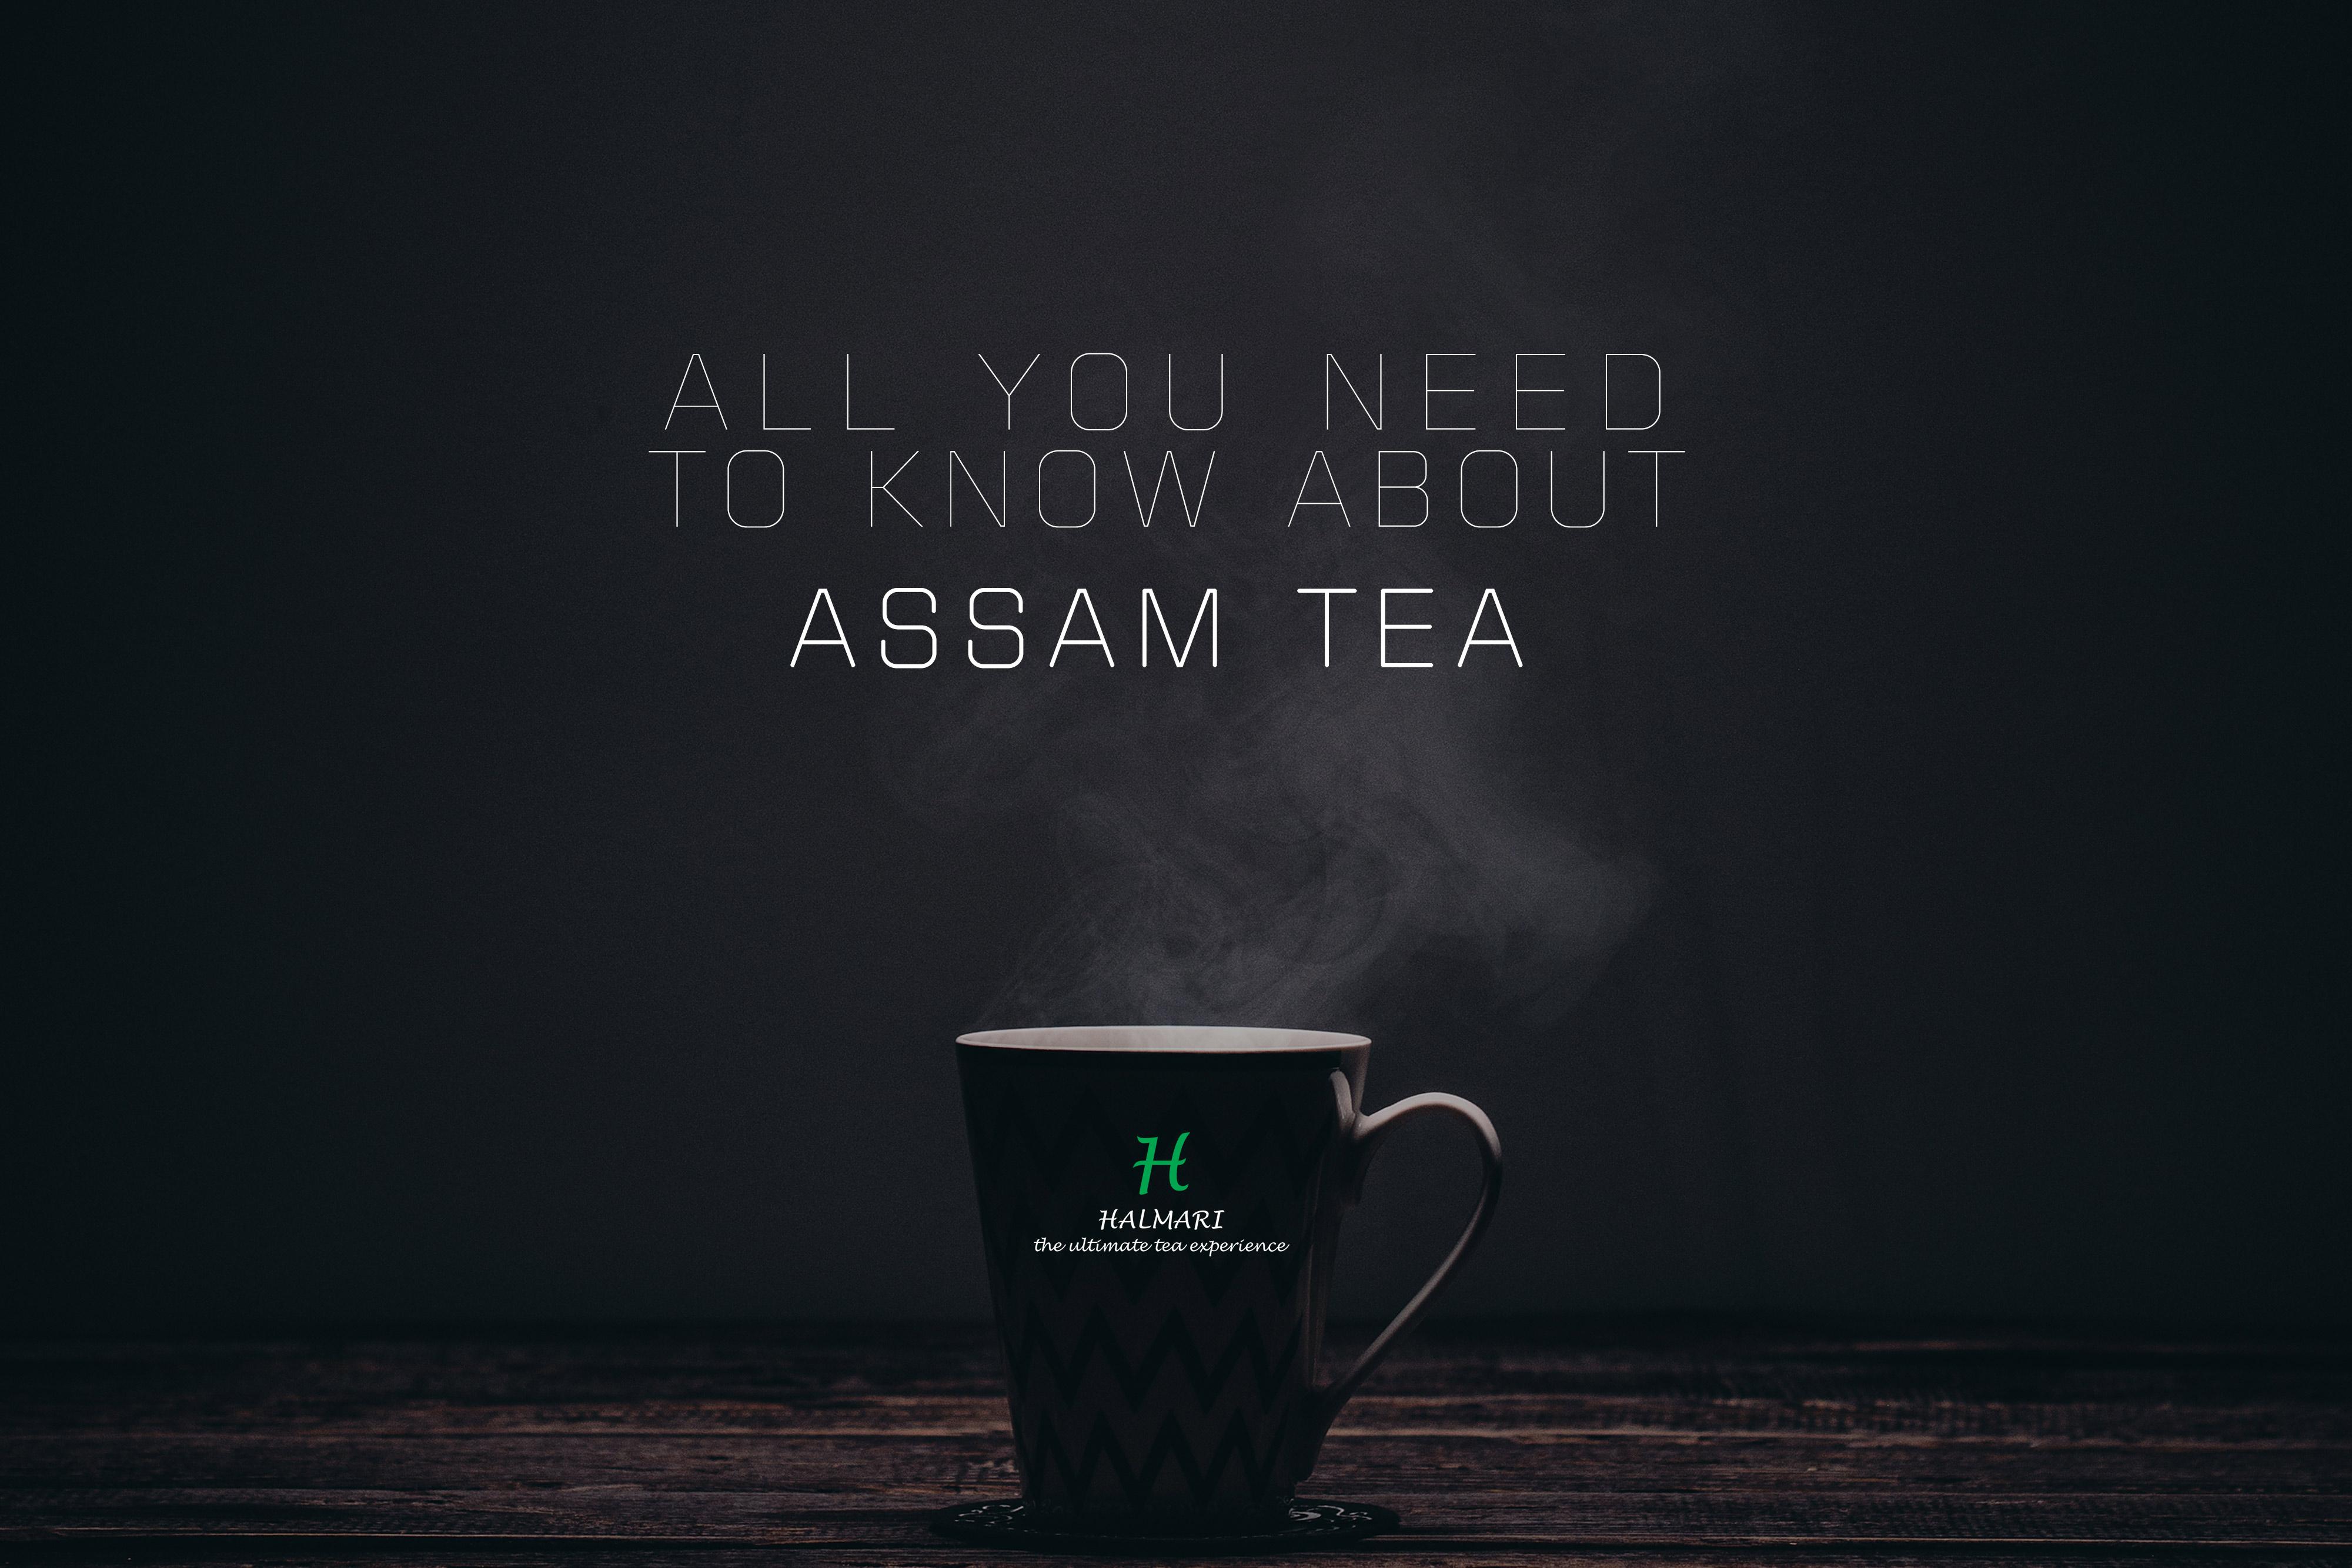 assam-tea-blog-image